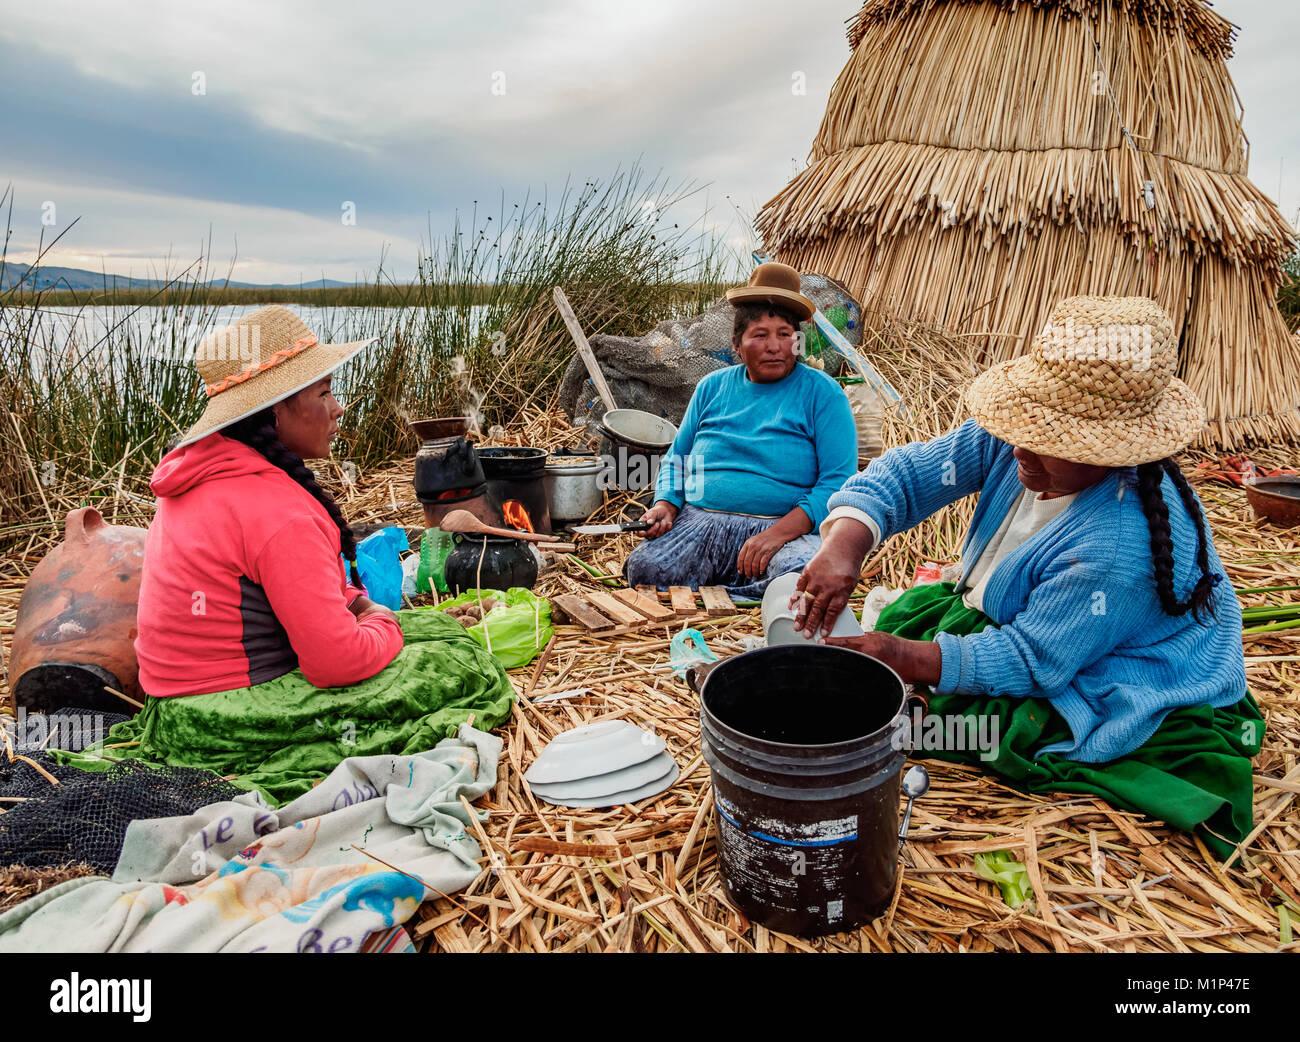 Native Uro Family preparing a meal, Uros Floating Islands, Lake Titicaca, Puno Region, Peru, South America - Stock Image